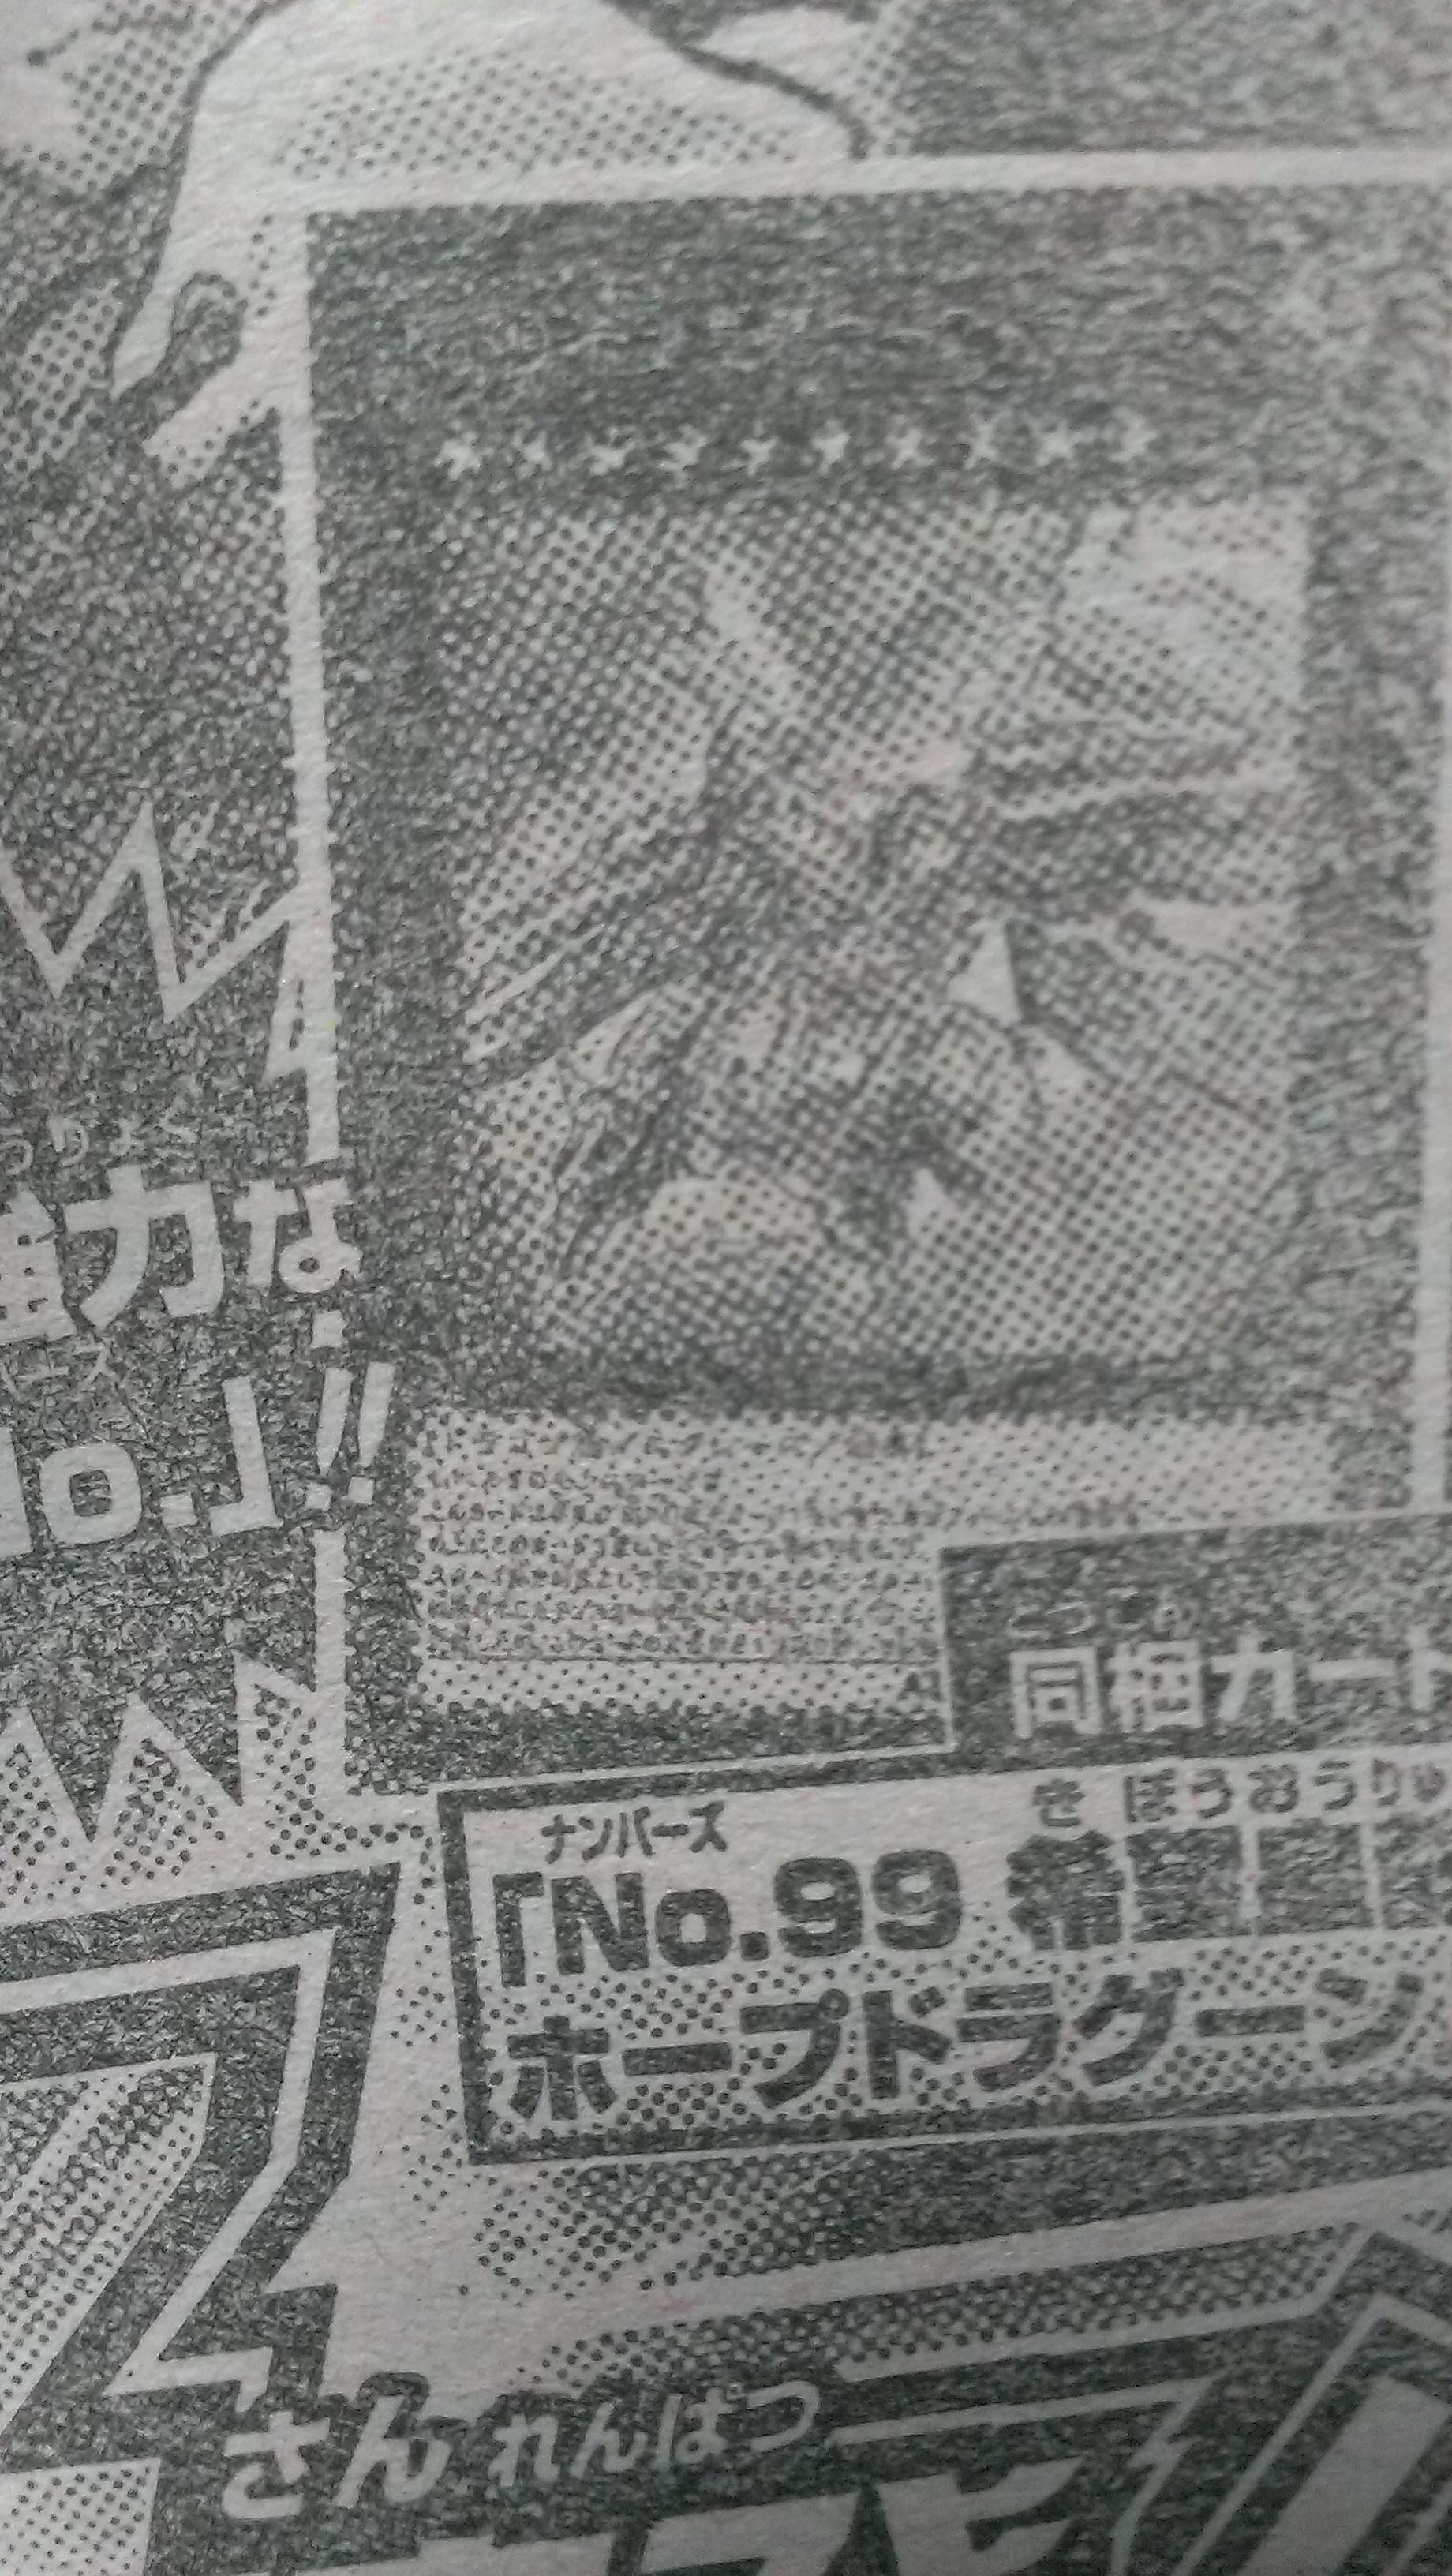 Hope dragun leaked 46f47b86